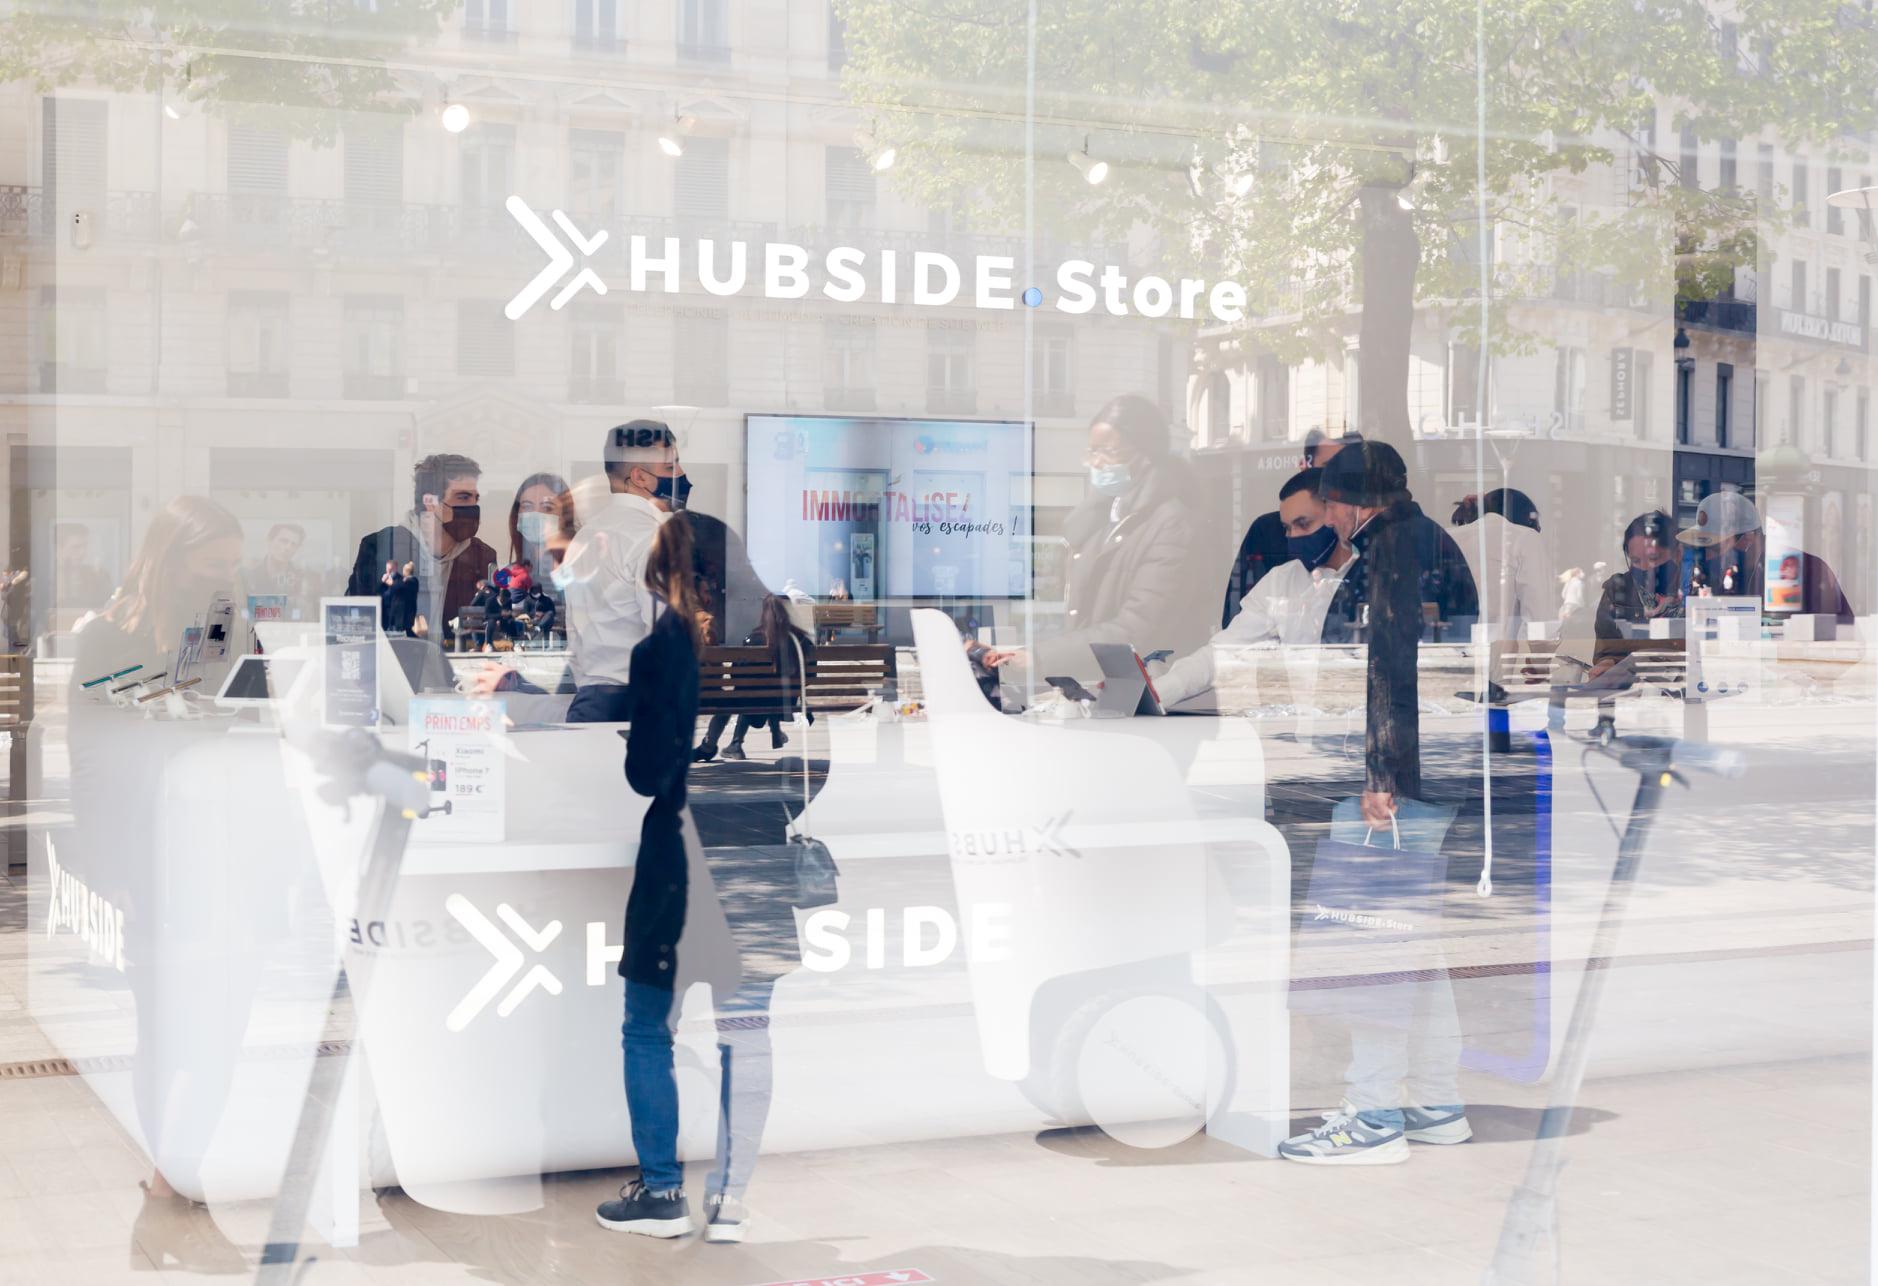 Hubside.Store